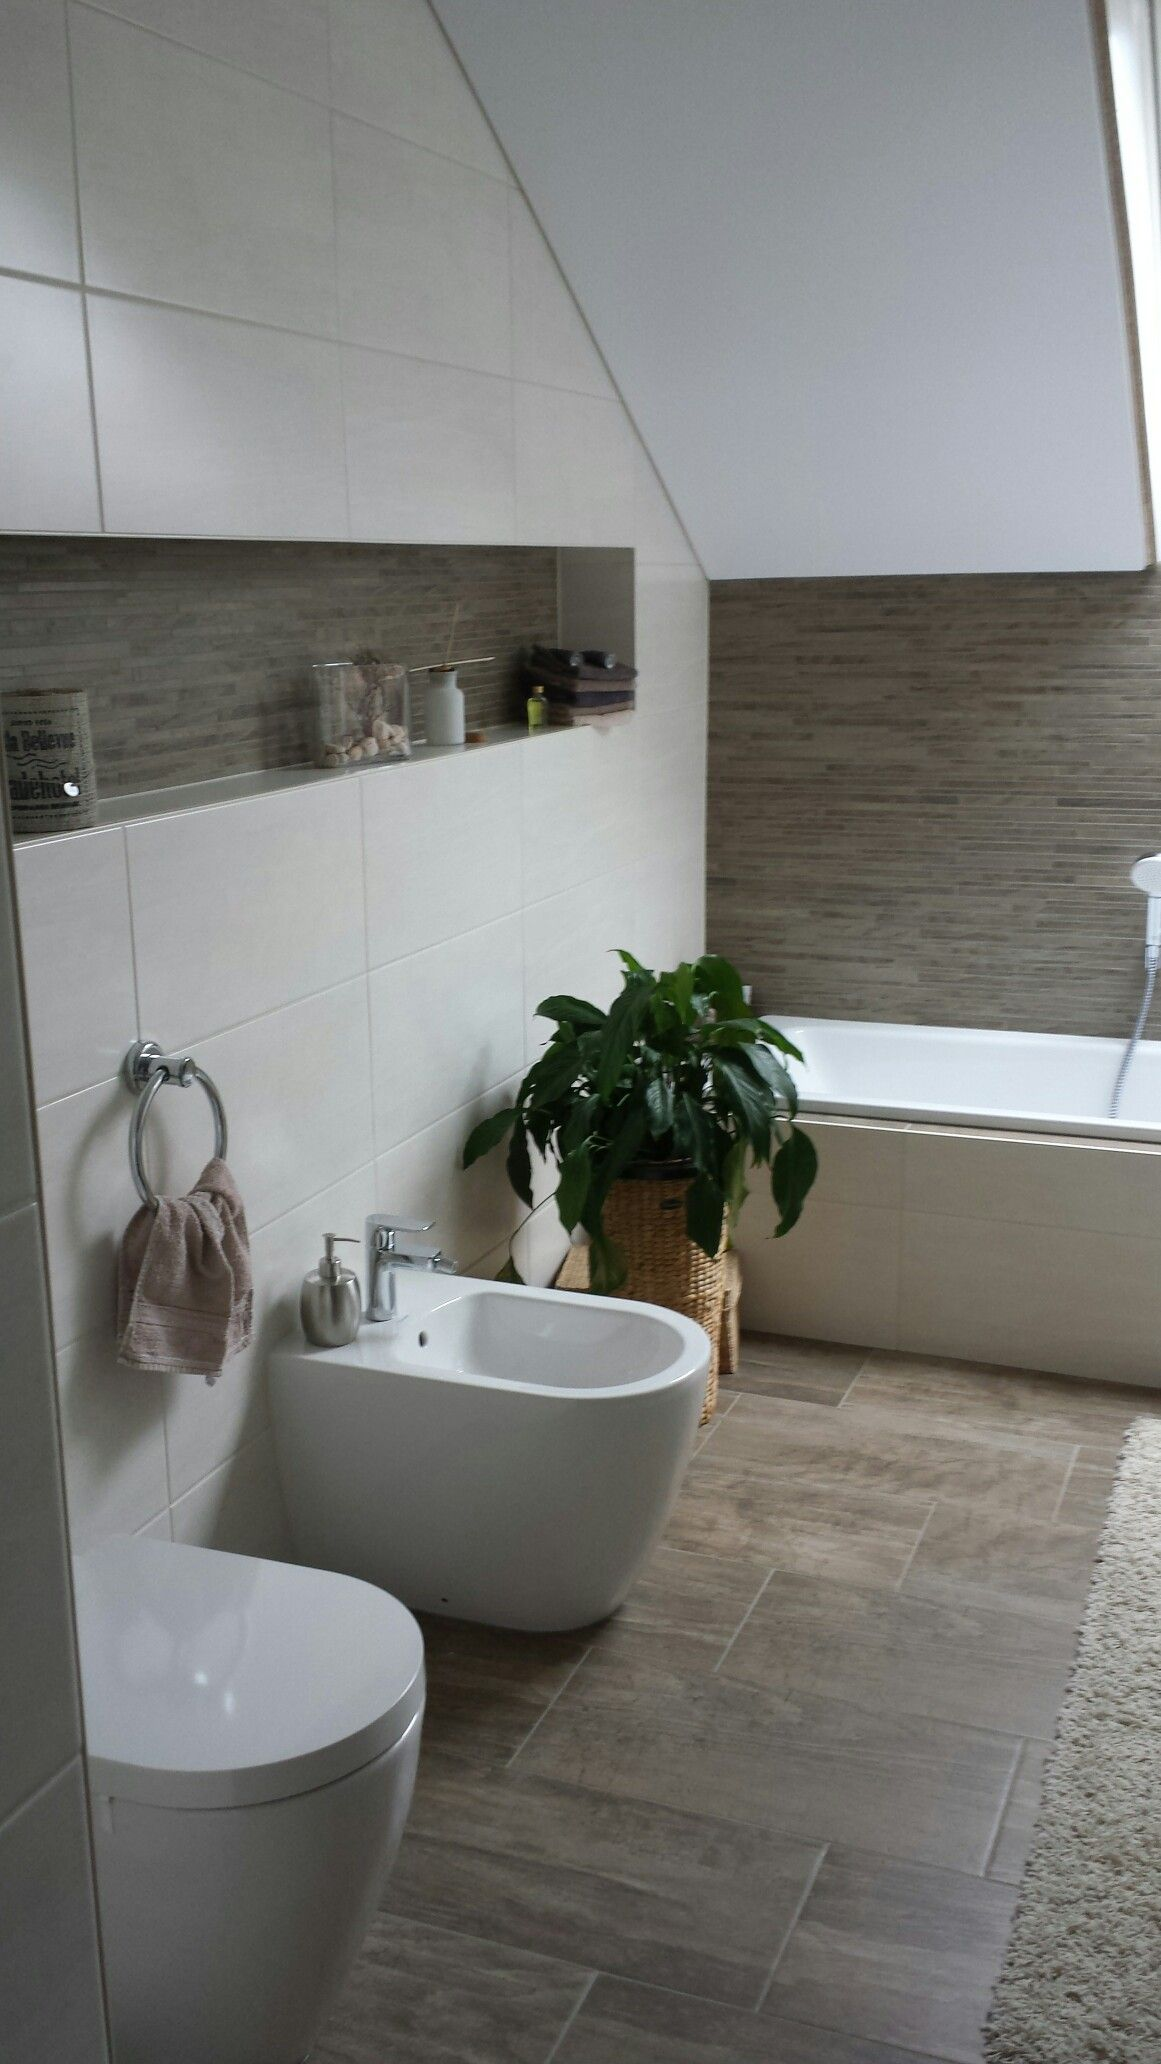 Badezimmer Fliesen In Holzoptik Badezimmer Fliesen Badezimmer Holzoptik Badezimmer Umbau